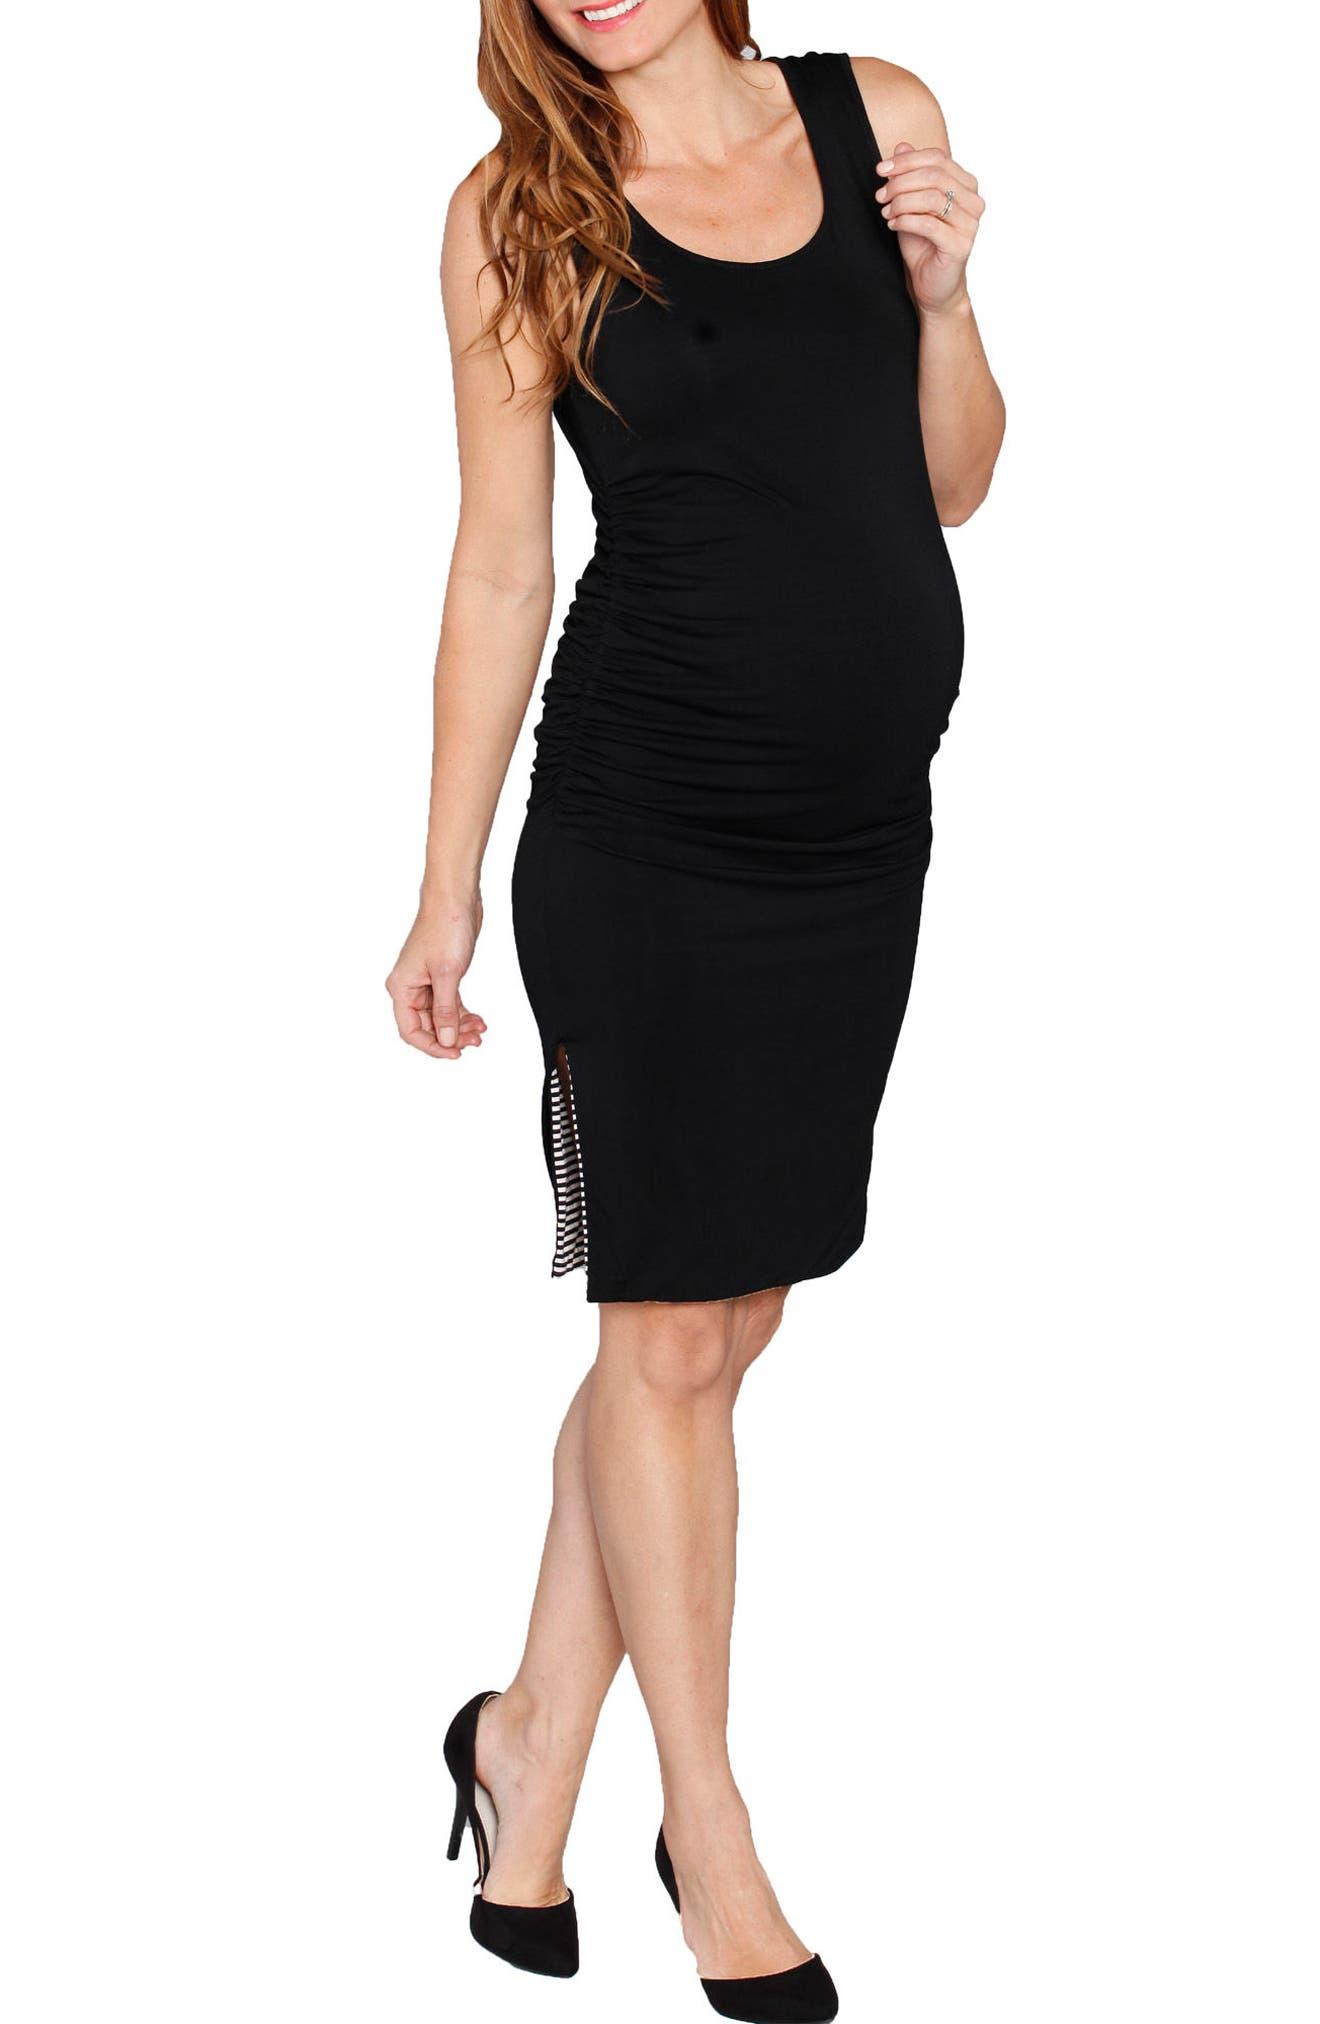 Angel Maternity Reversible Maternity Tank Dress, Black